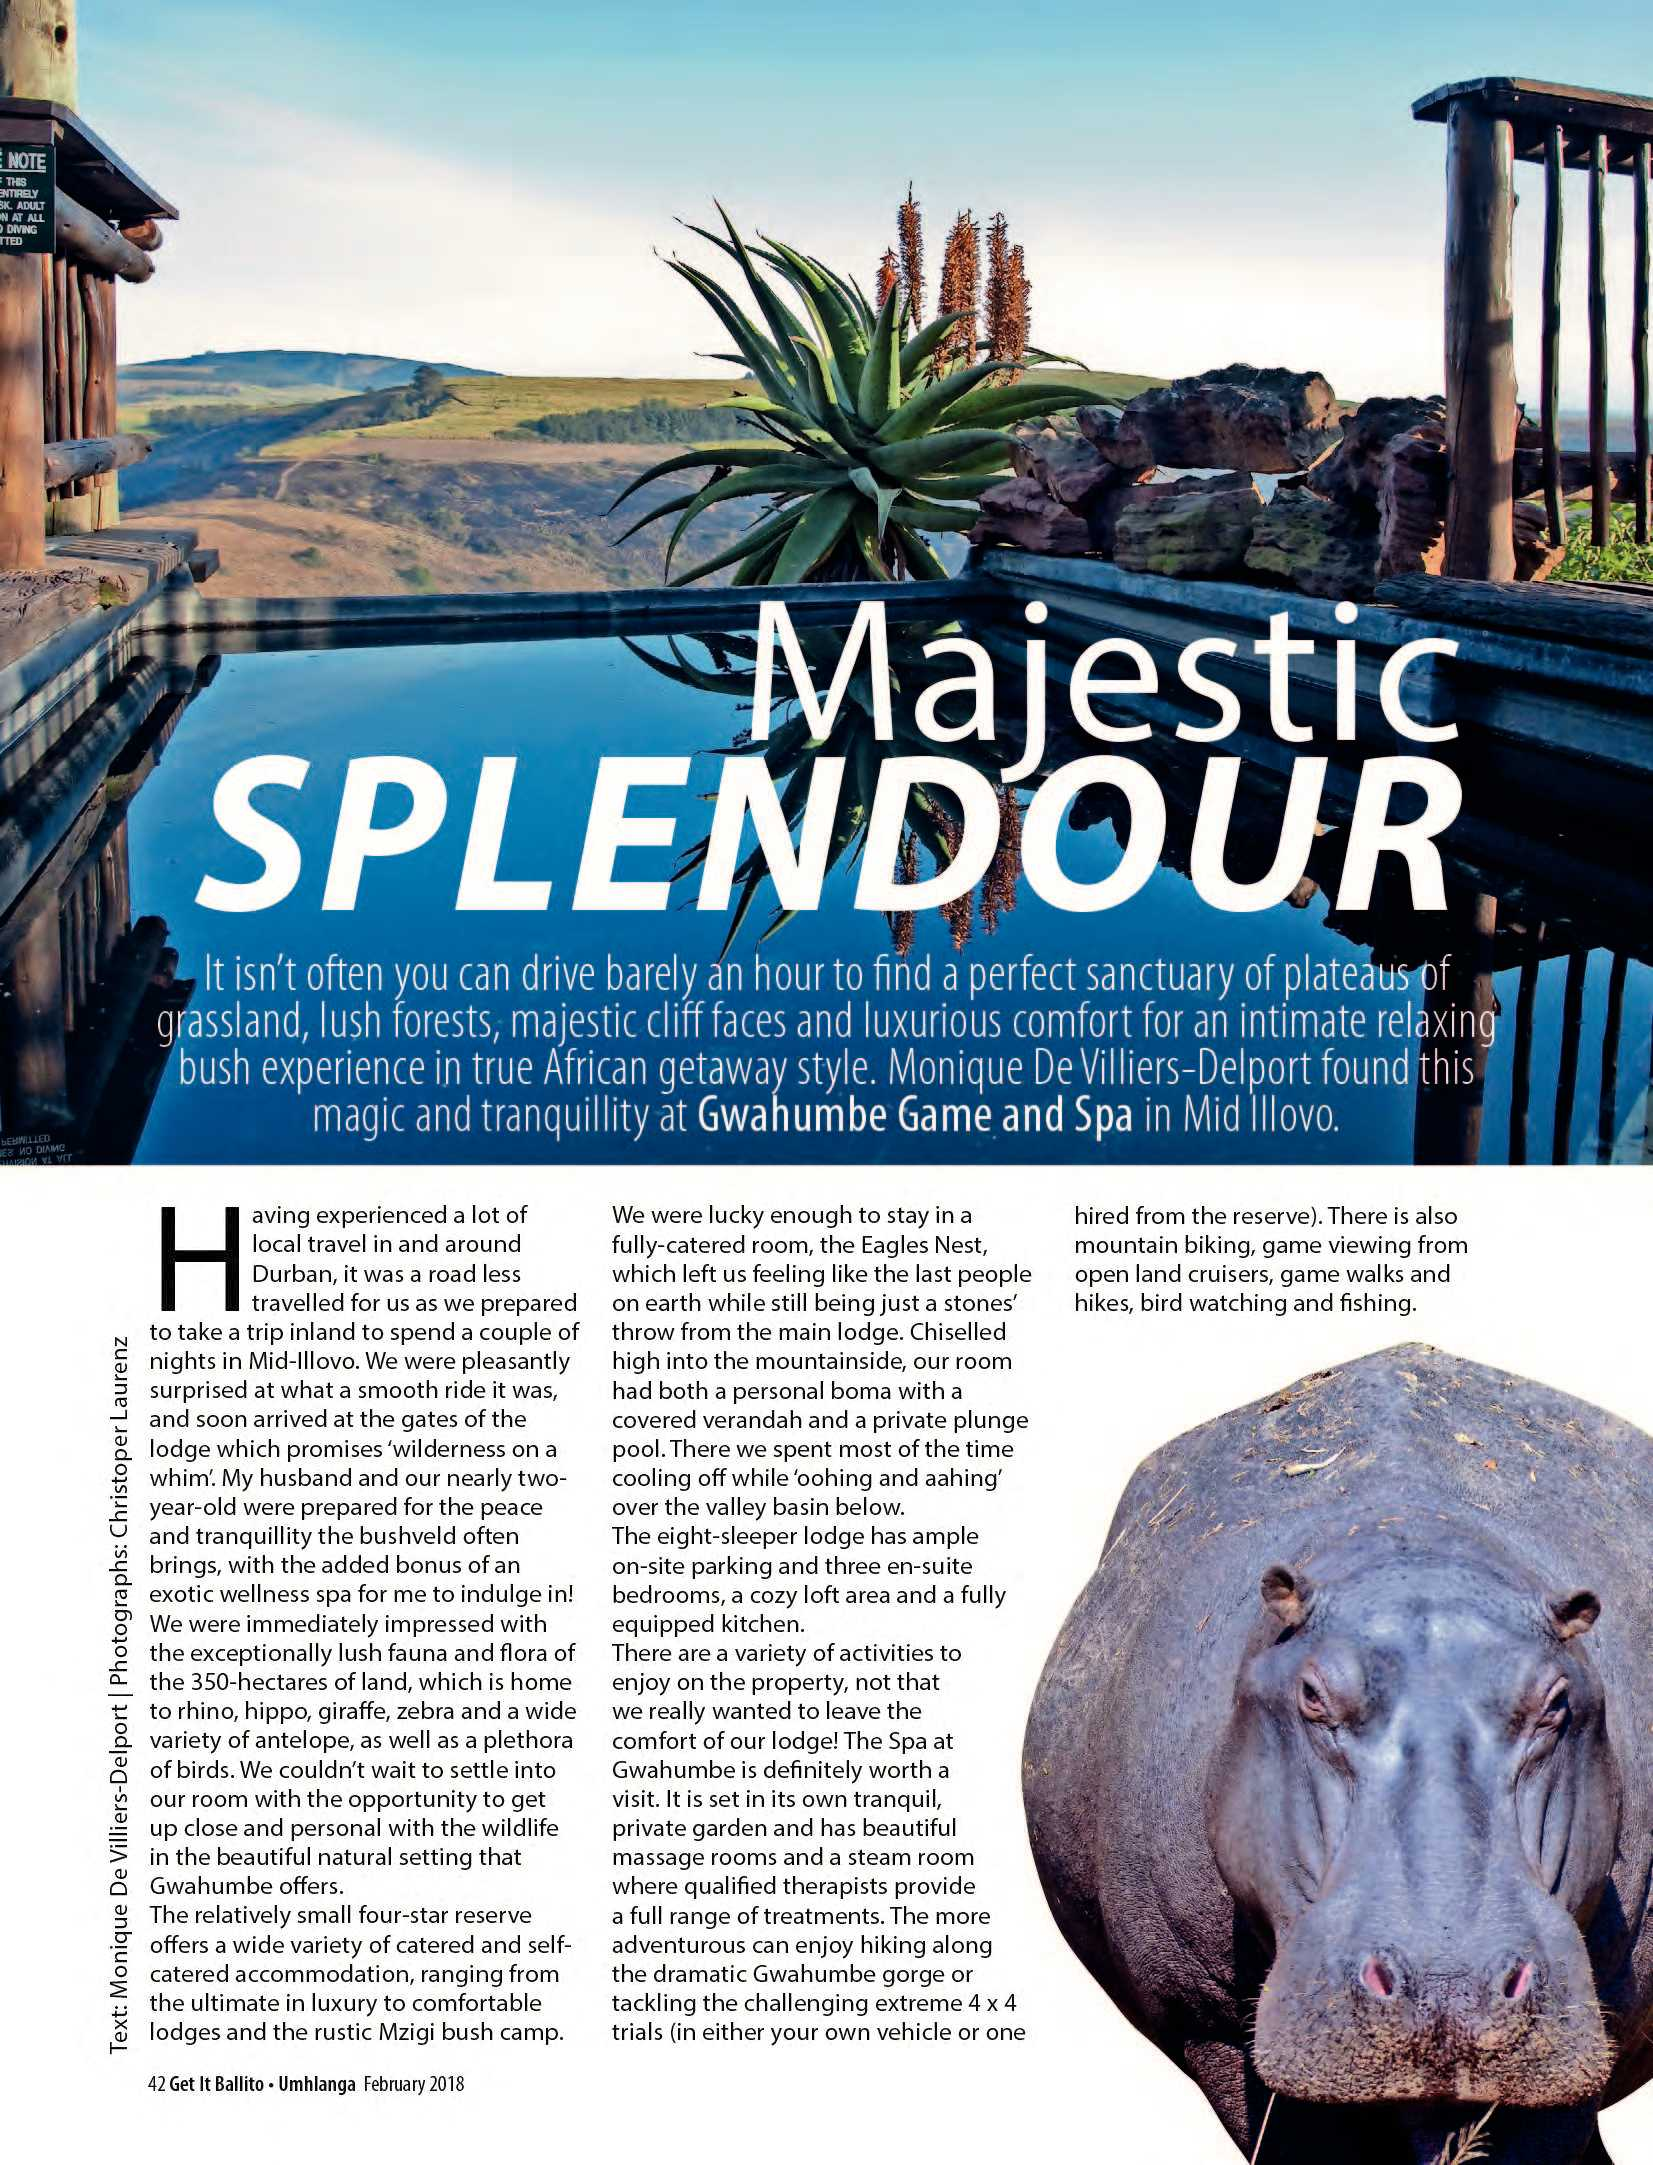 get-magazine-ballitoumhlanga-march-2018-epapers-page-44